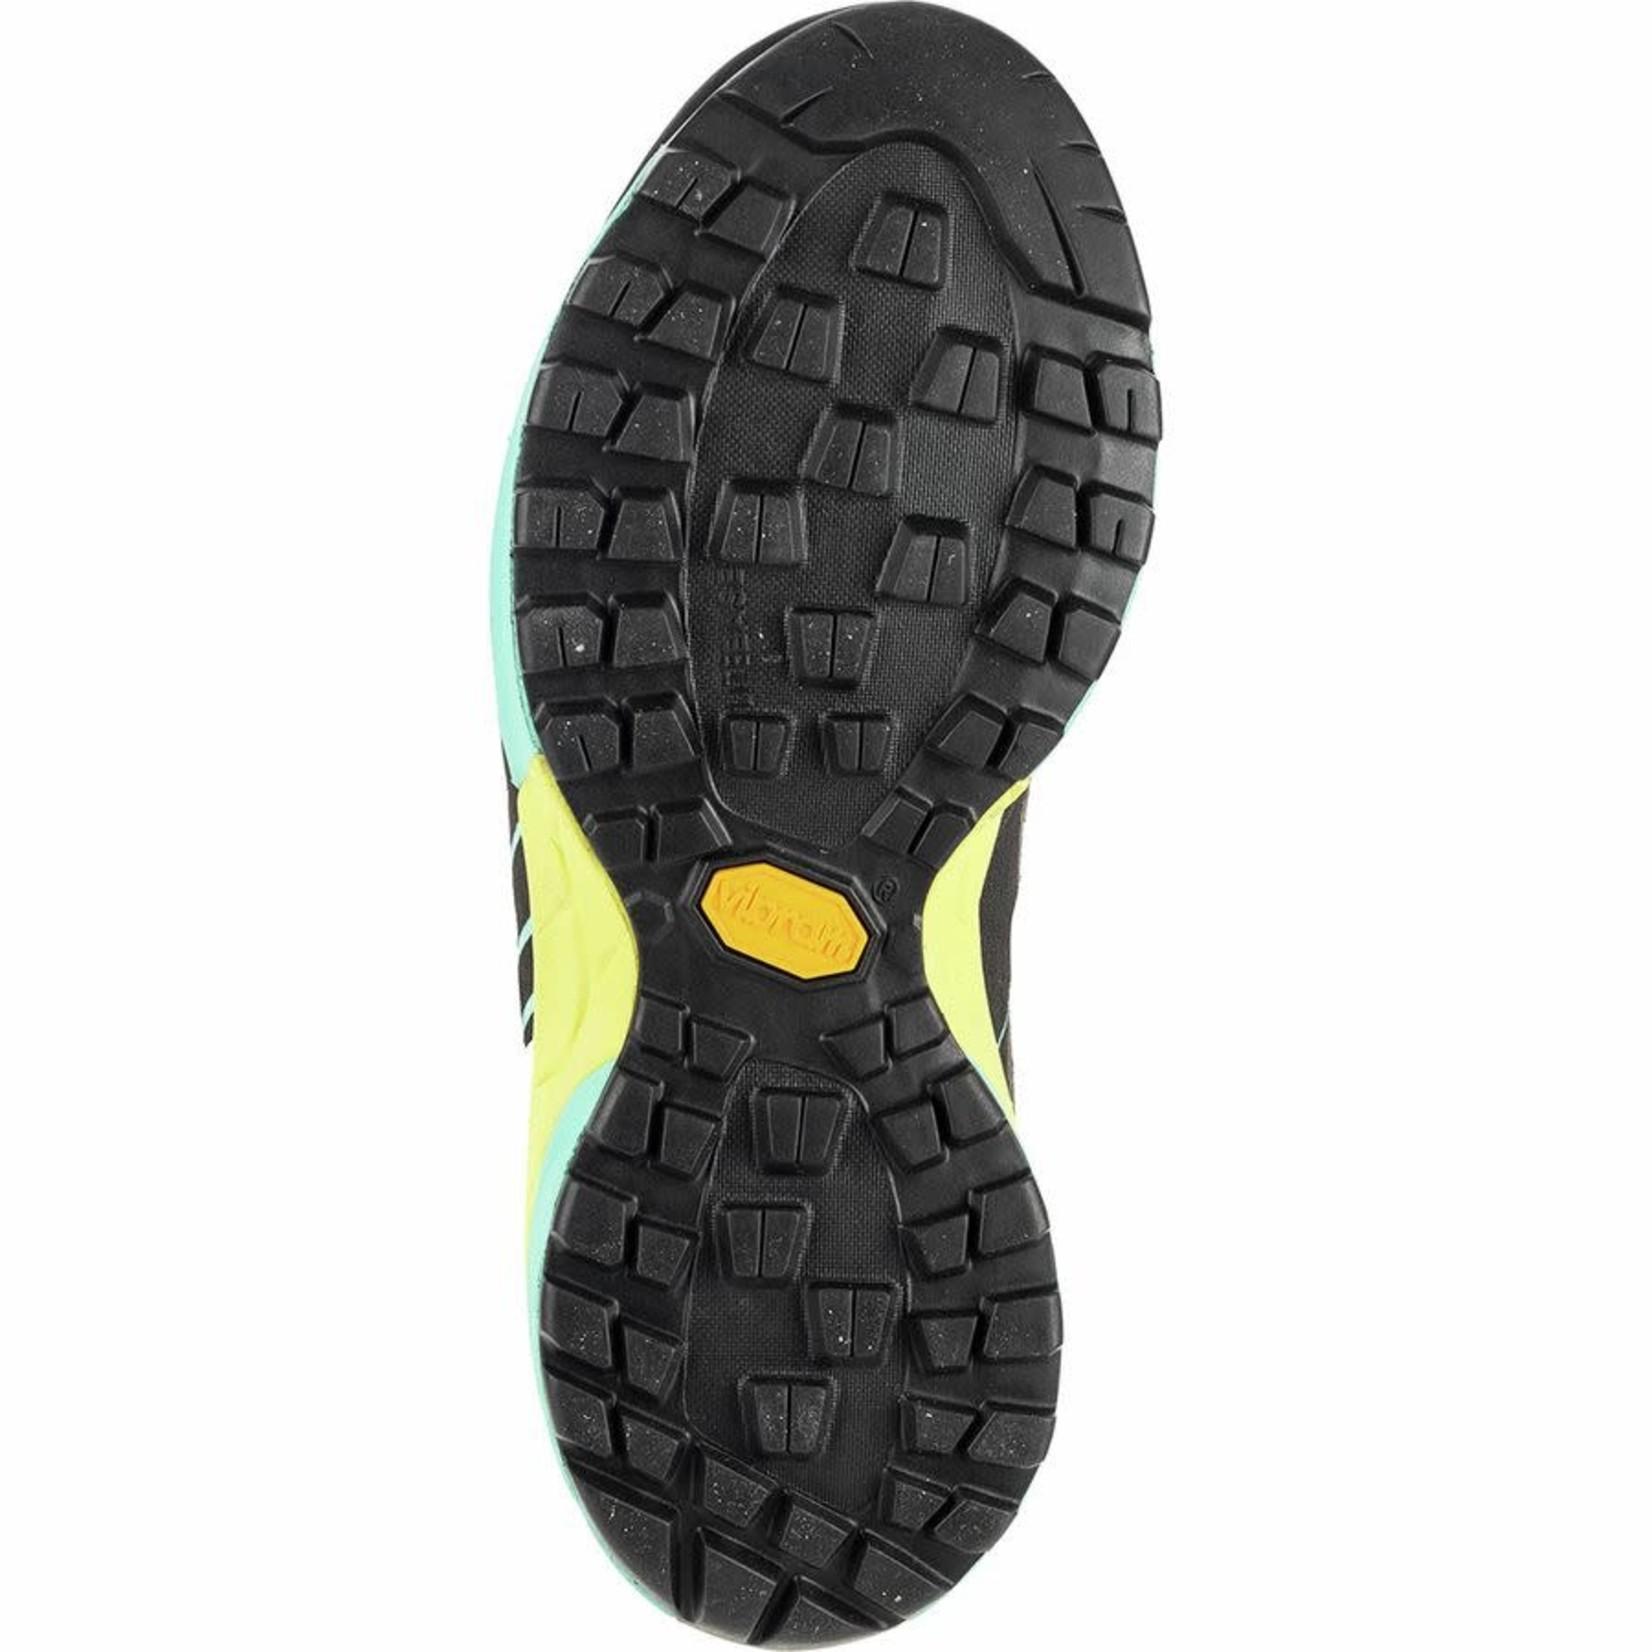 Scarpa Chaussure d'approche  Scarpa Mescalito - Femme